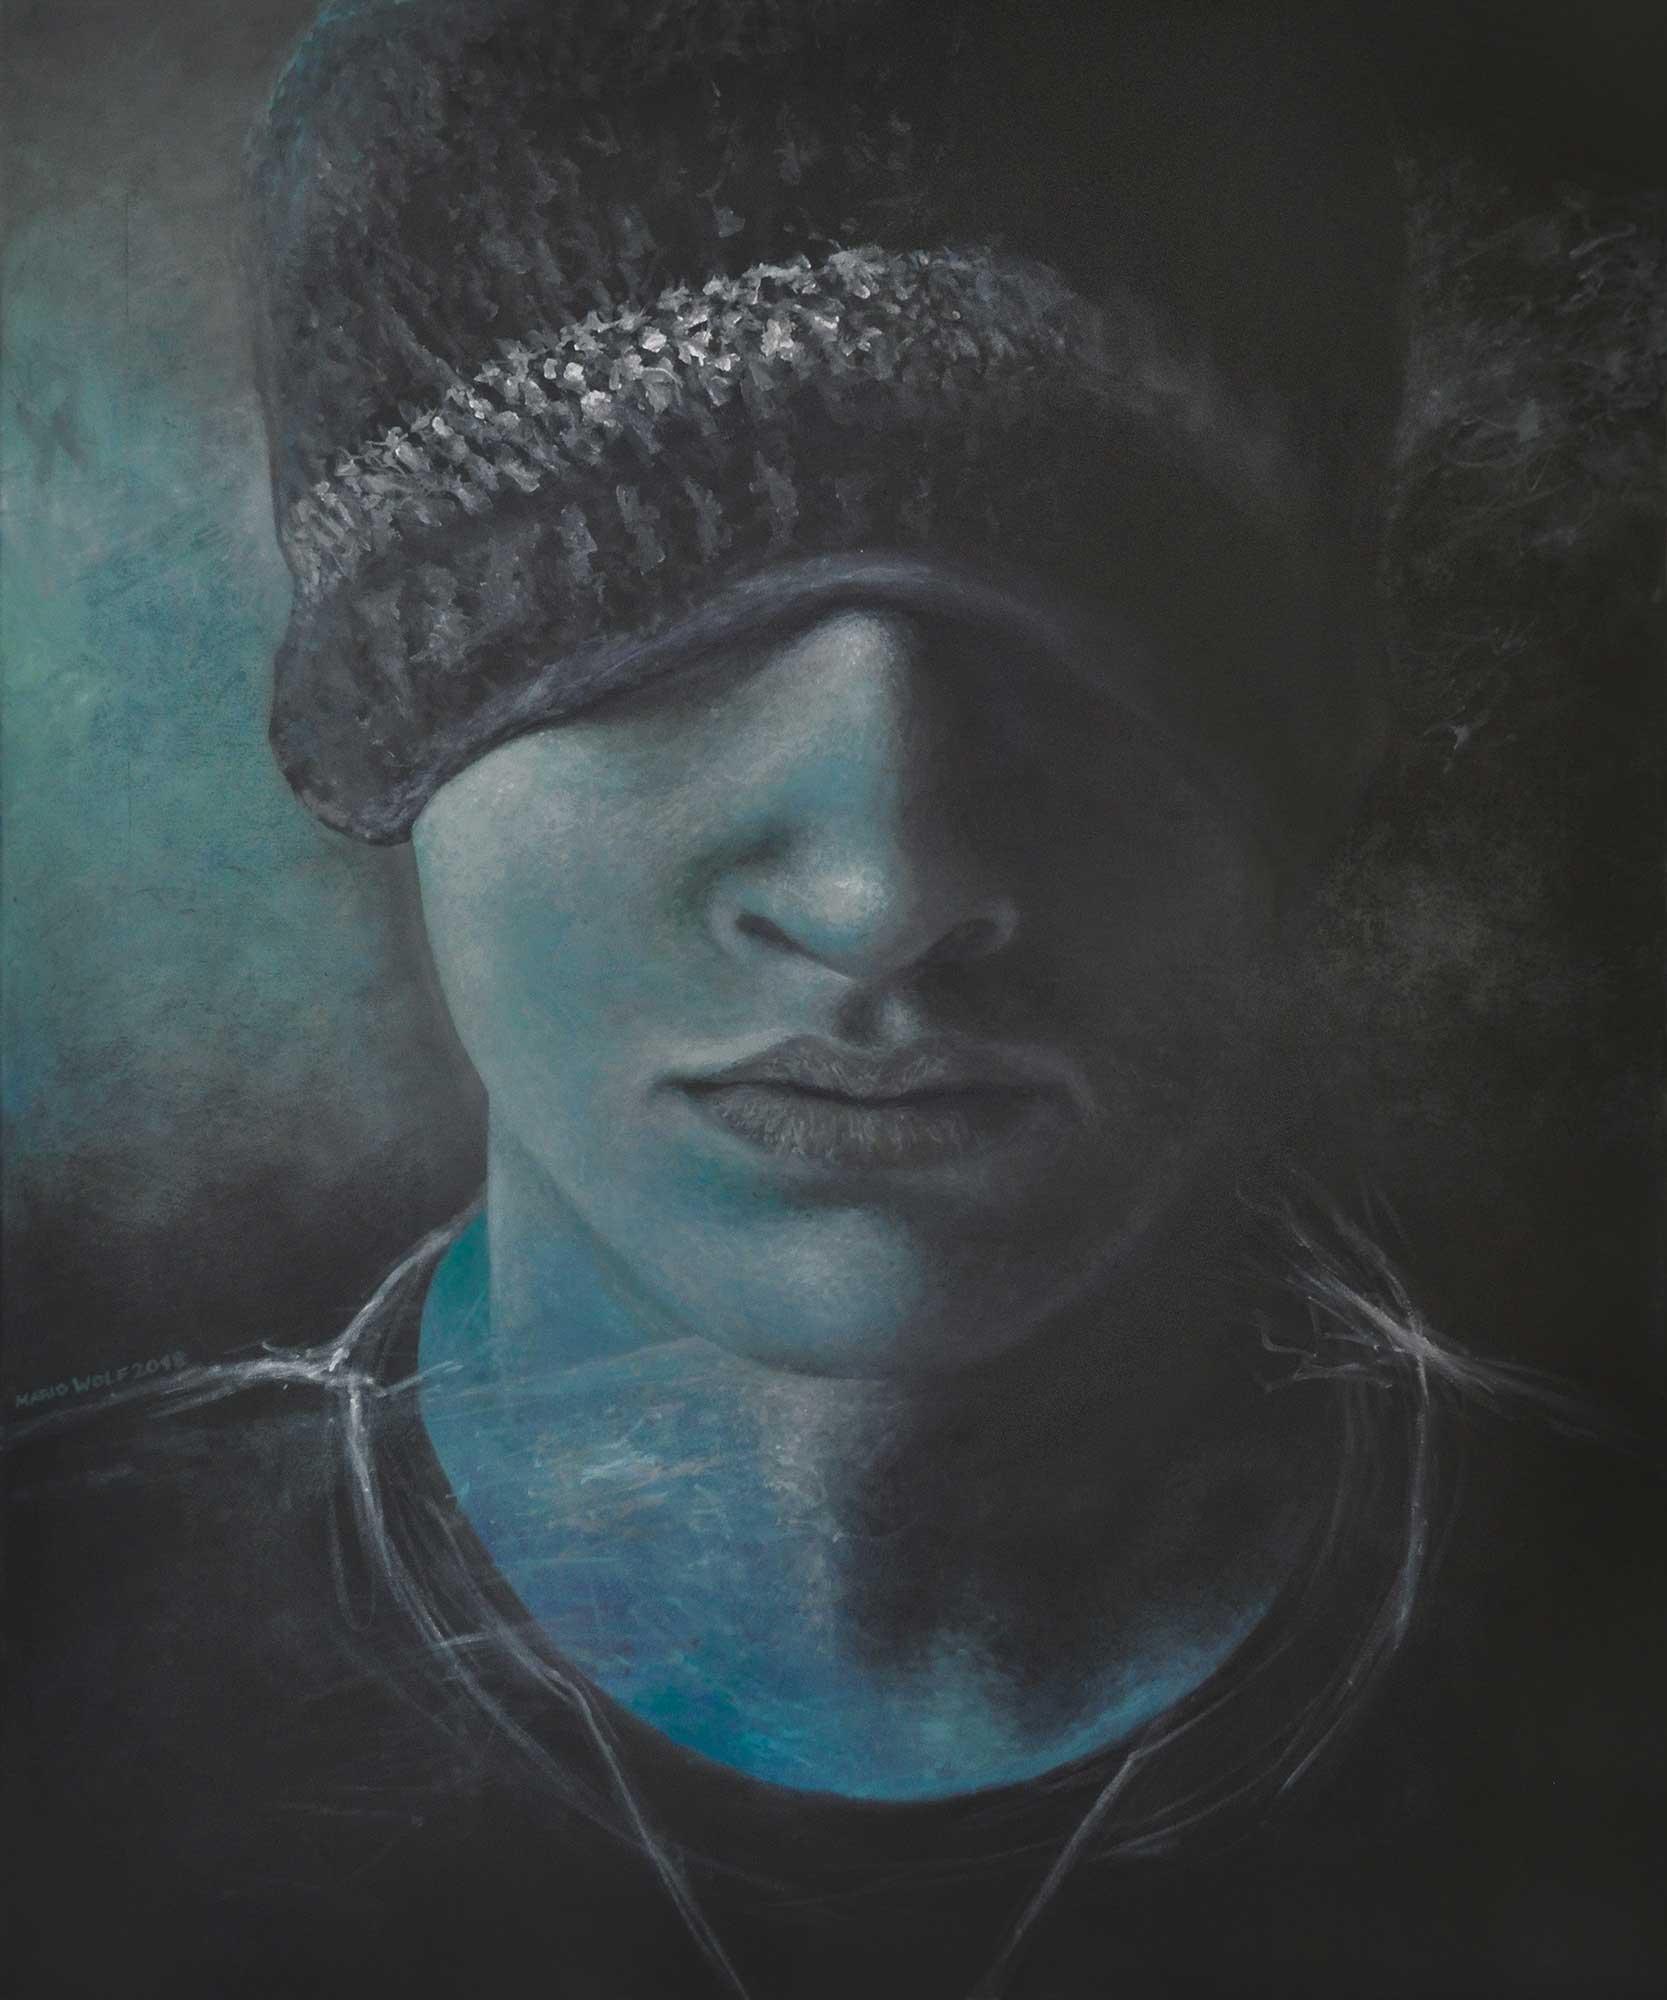 Intro - Kunstwerk, Kunst, Malerei - Mario Wolf Künstler